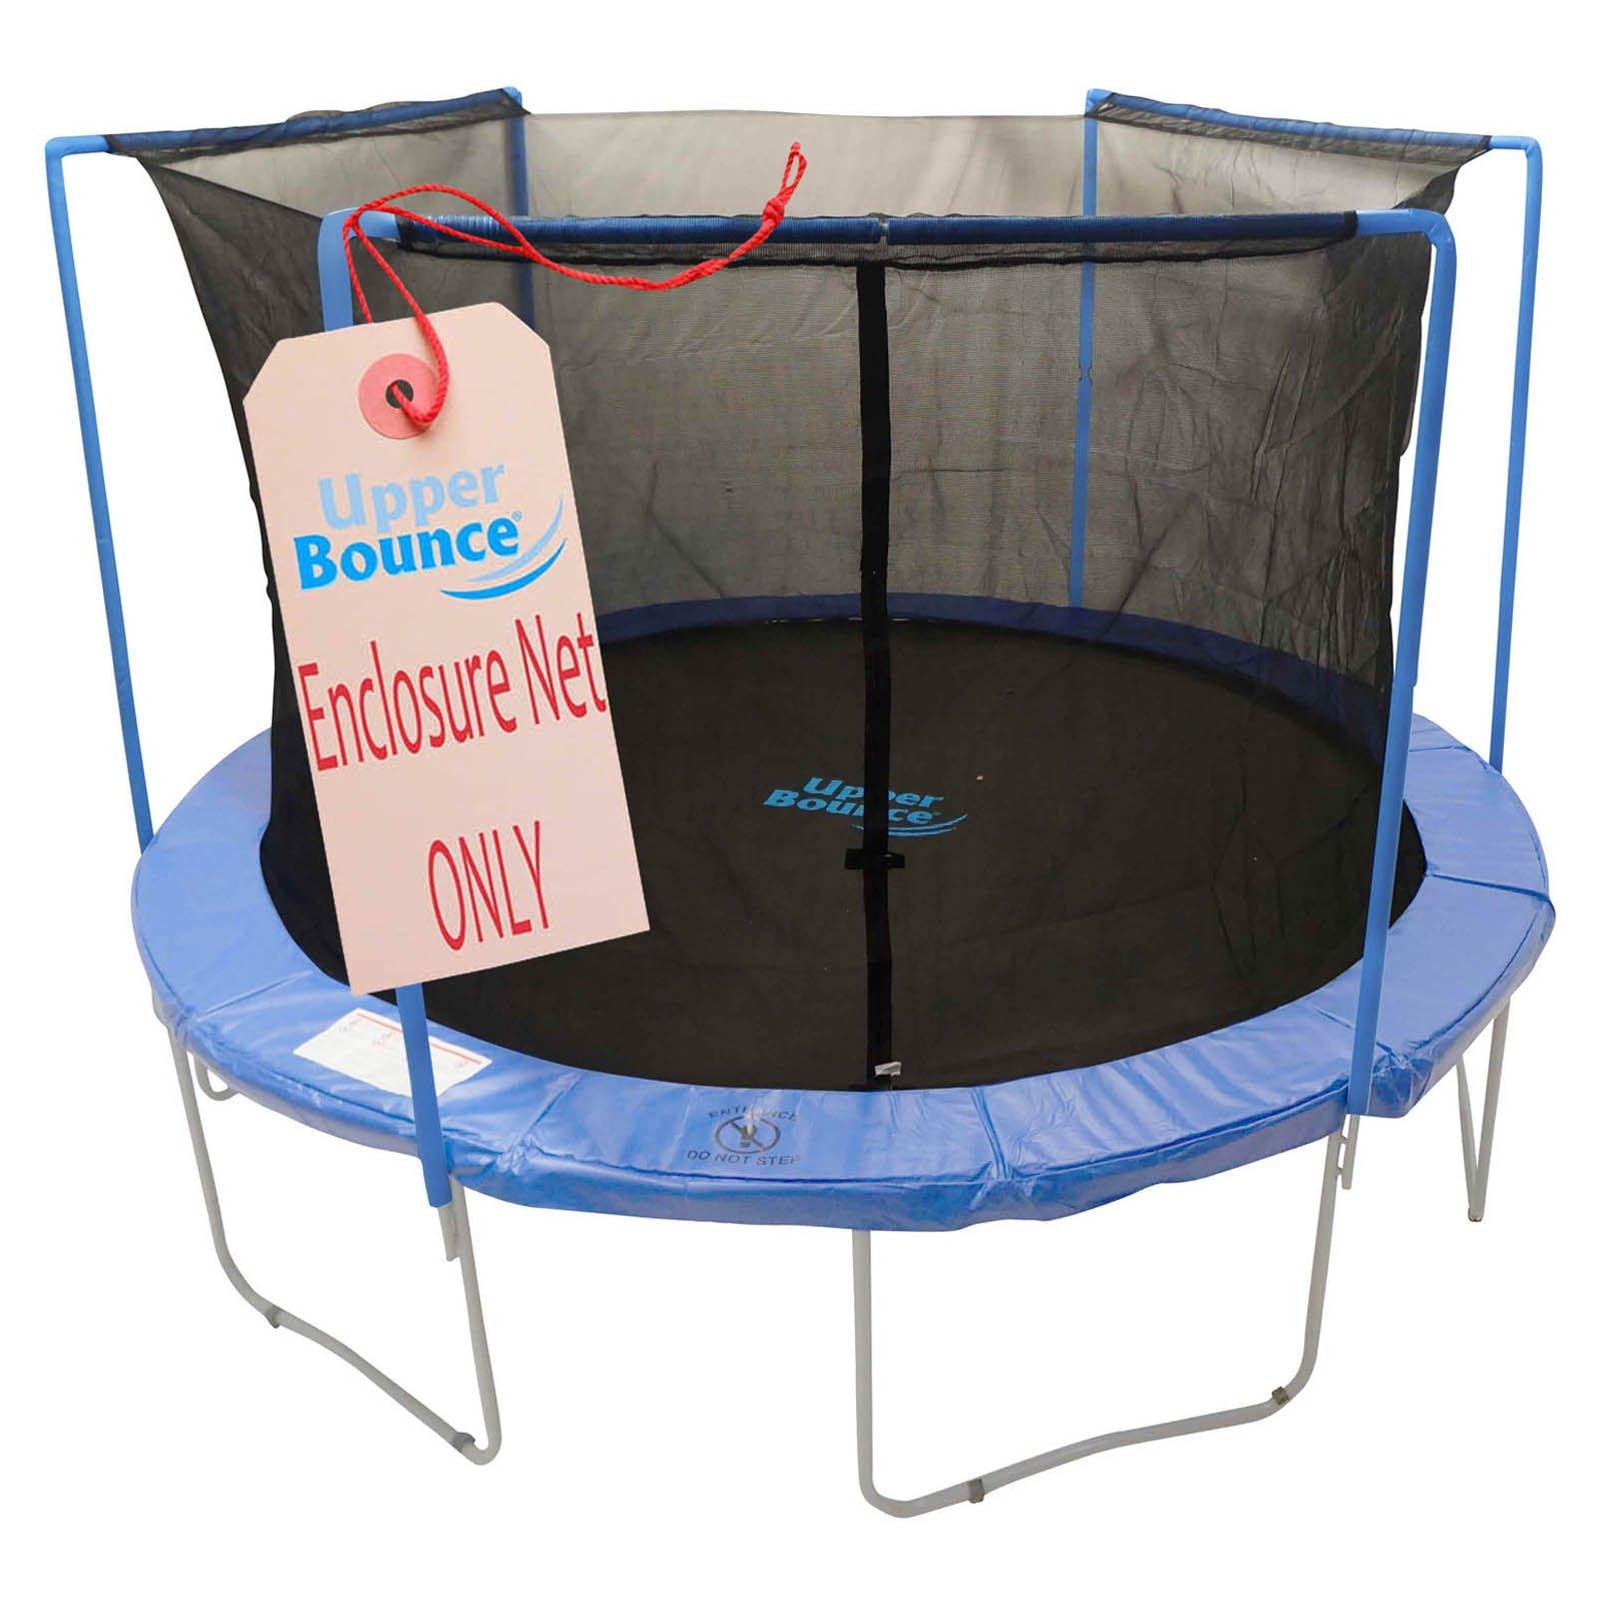 Upper Bounce 7 ft. Trampoline Enclosure Safety Net